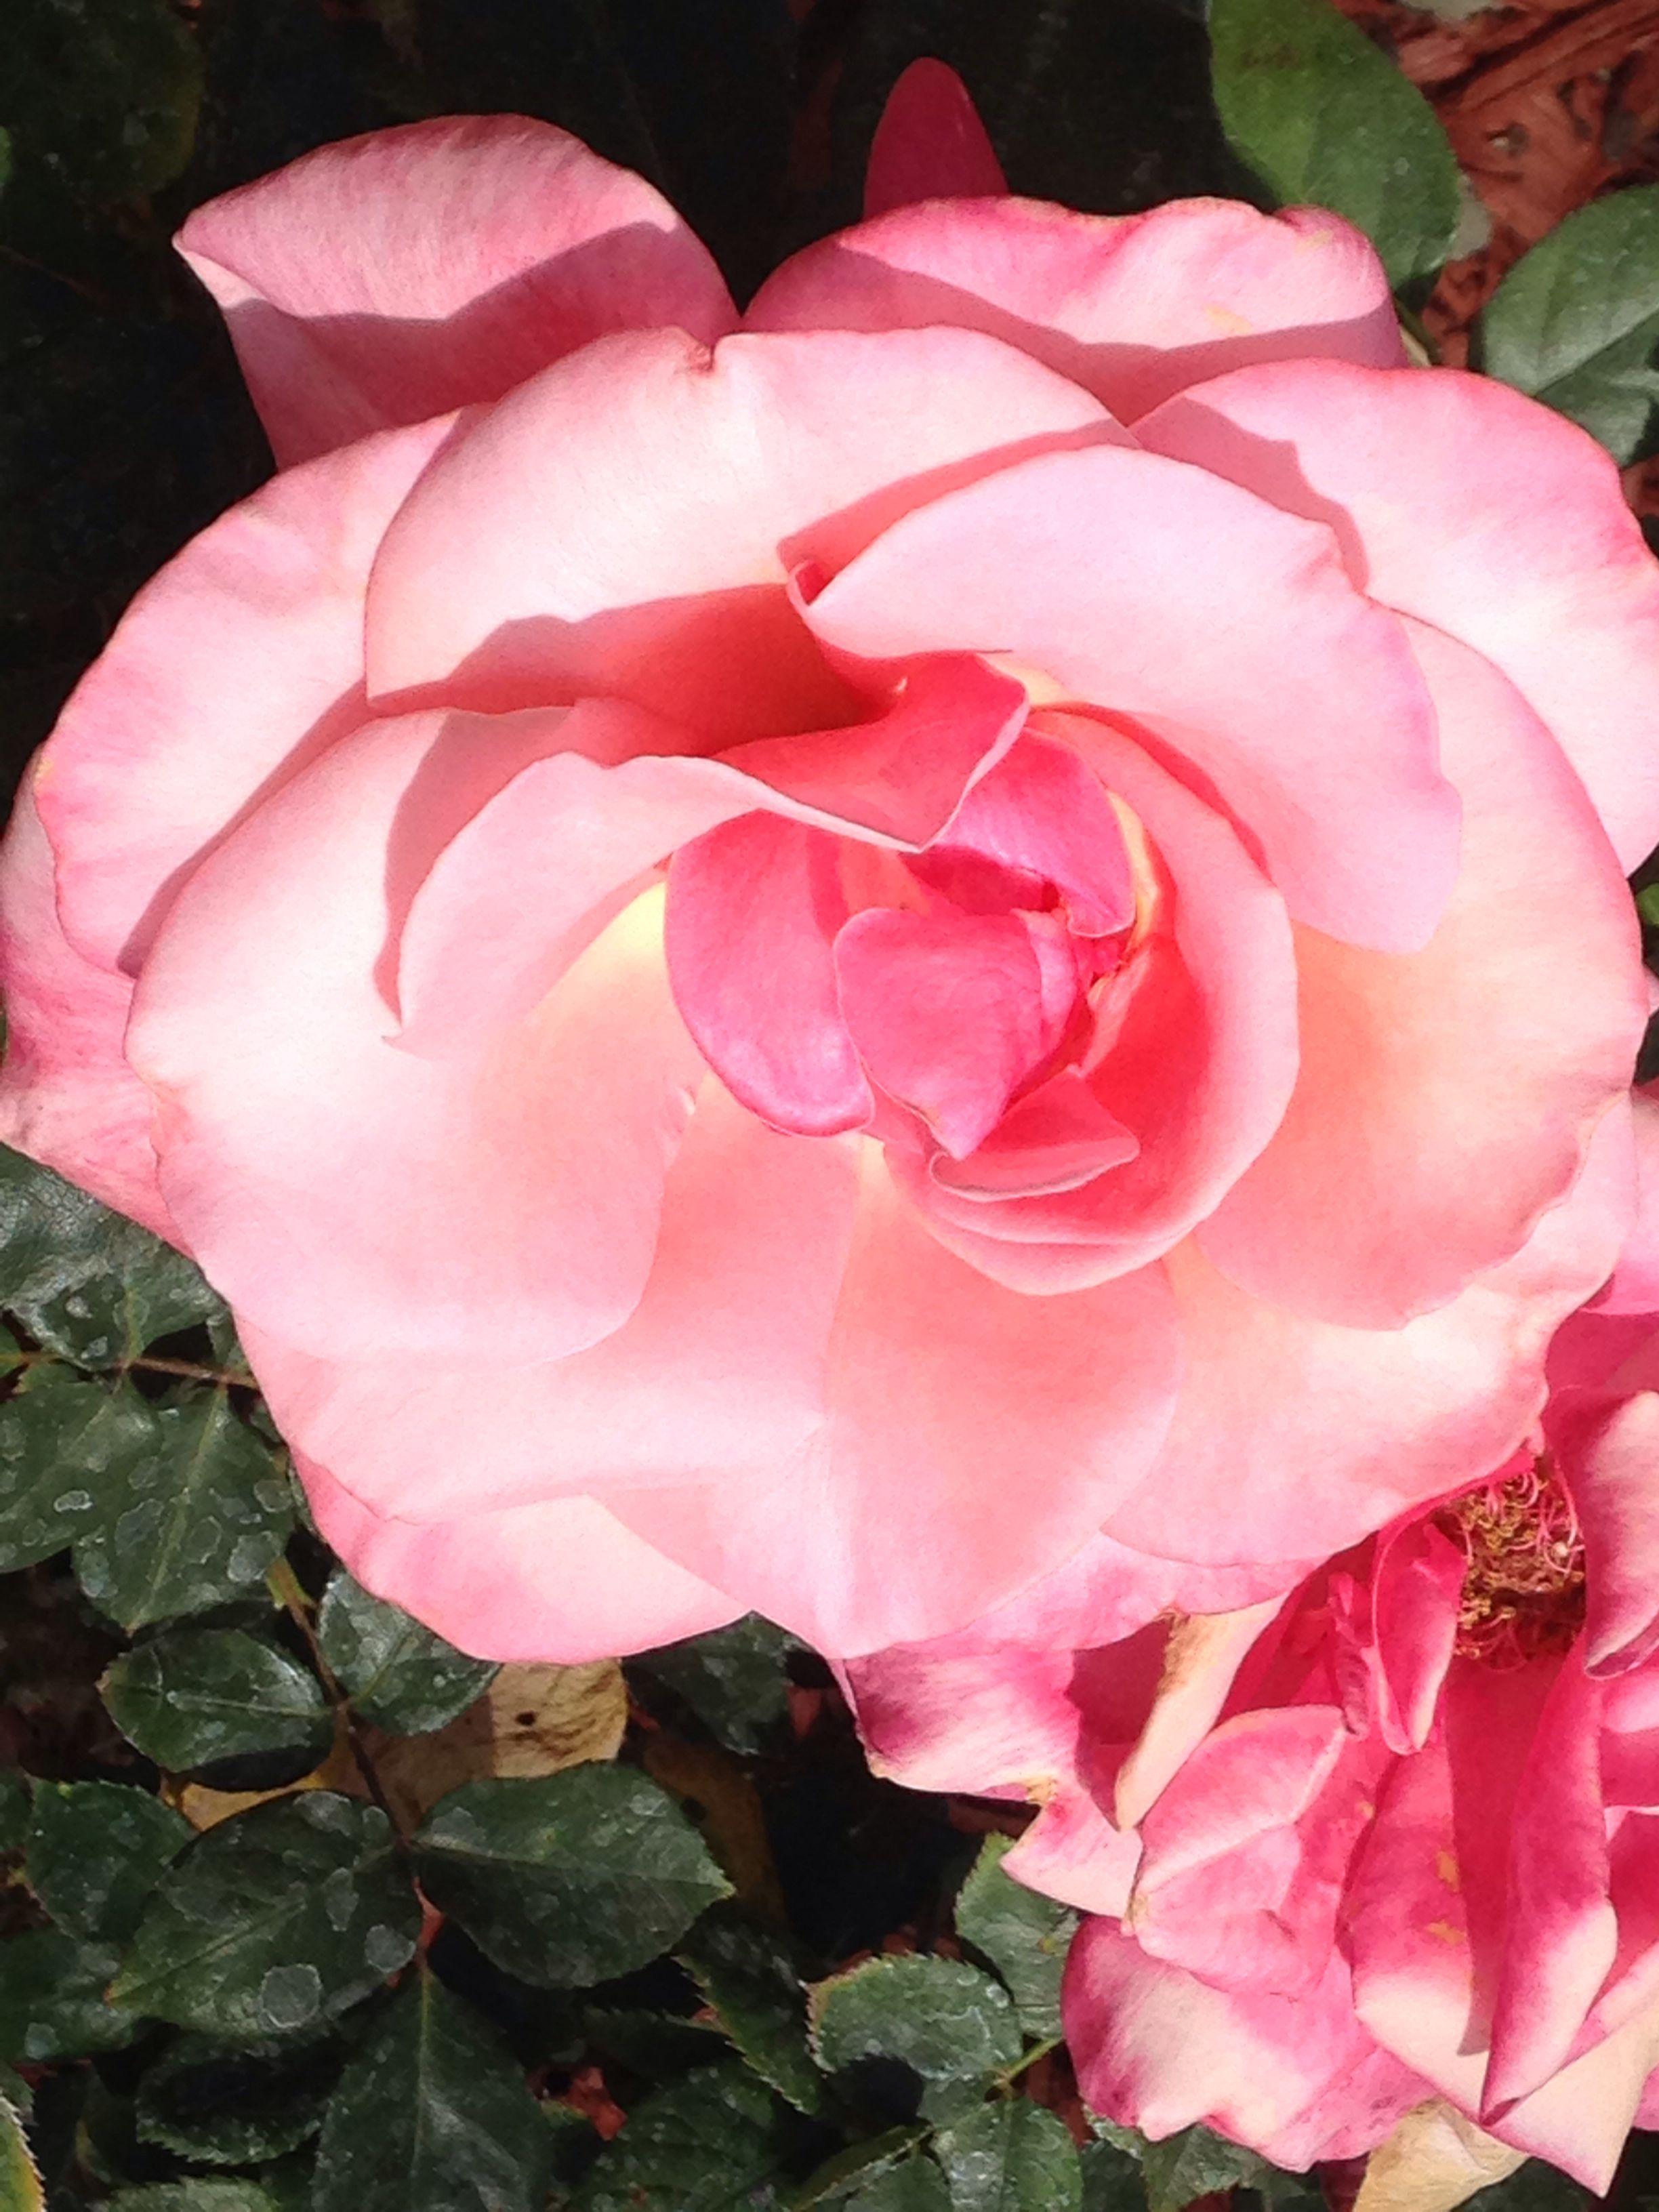 A rose in my moms garden